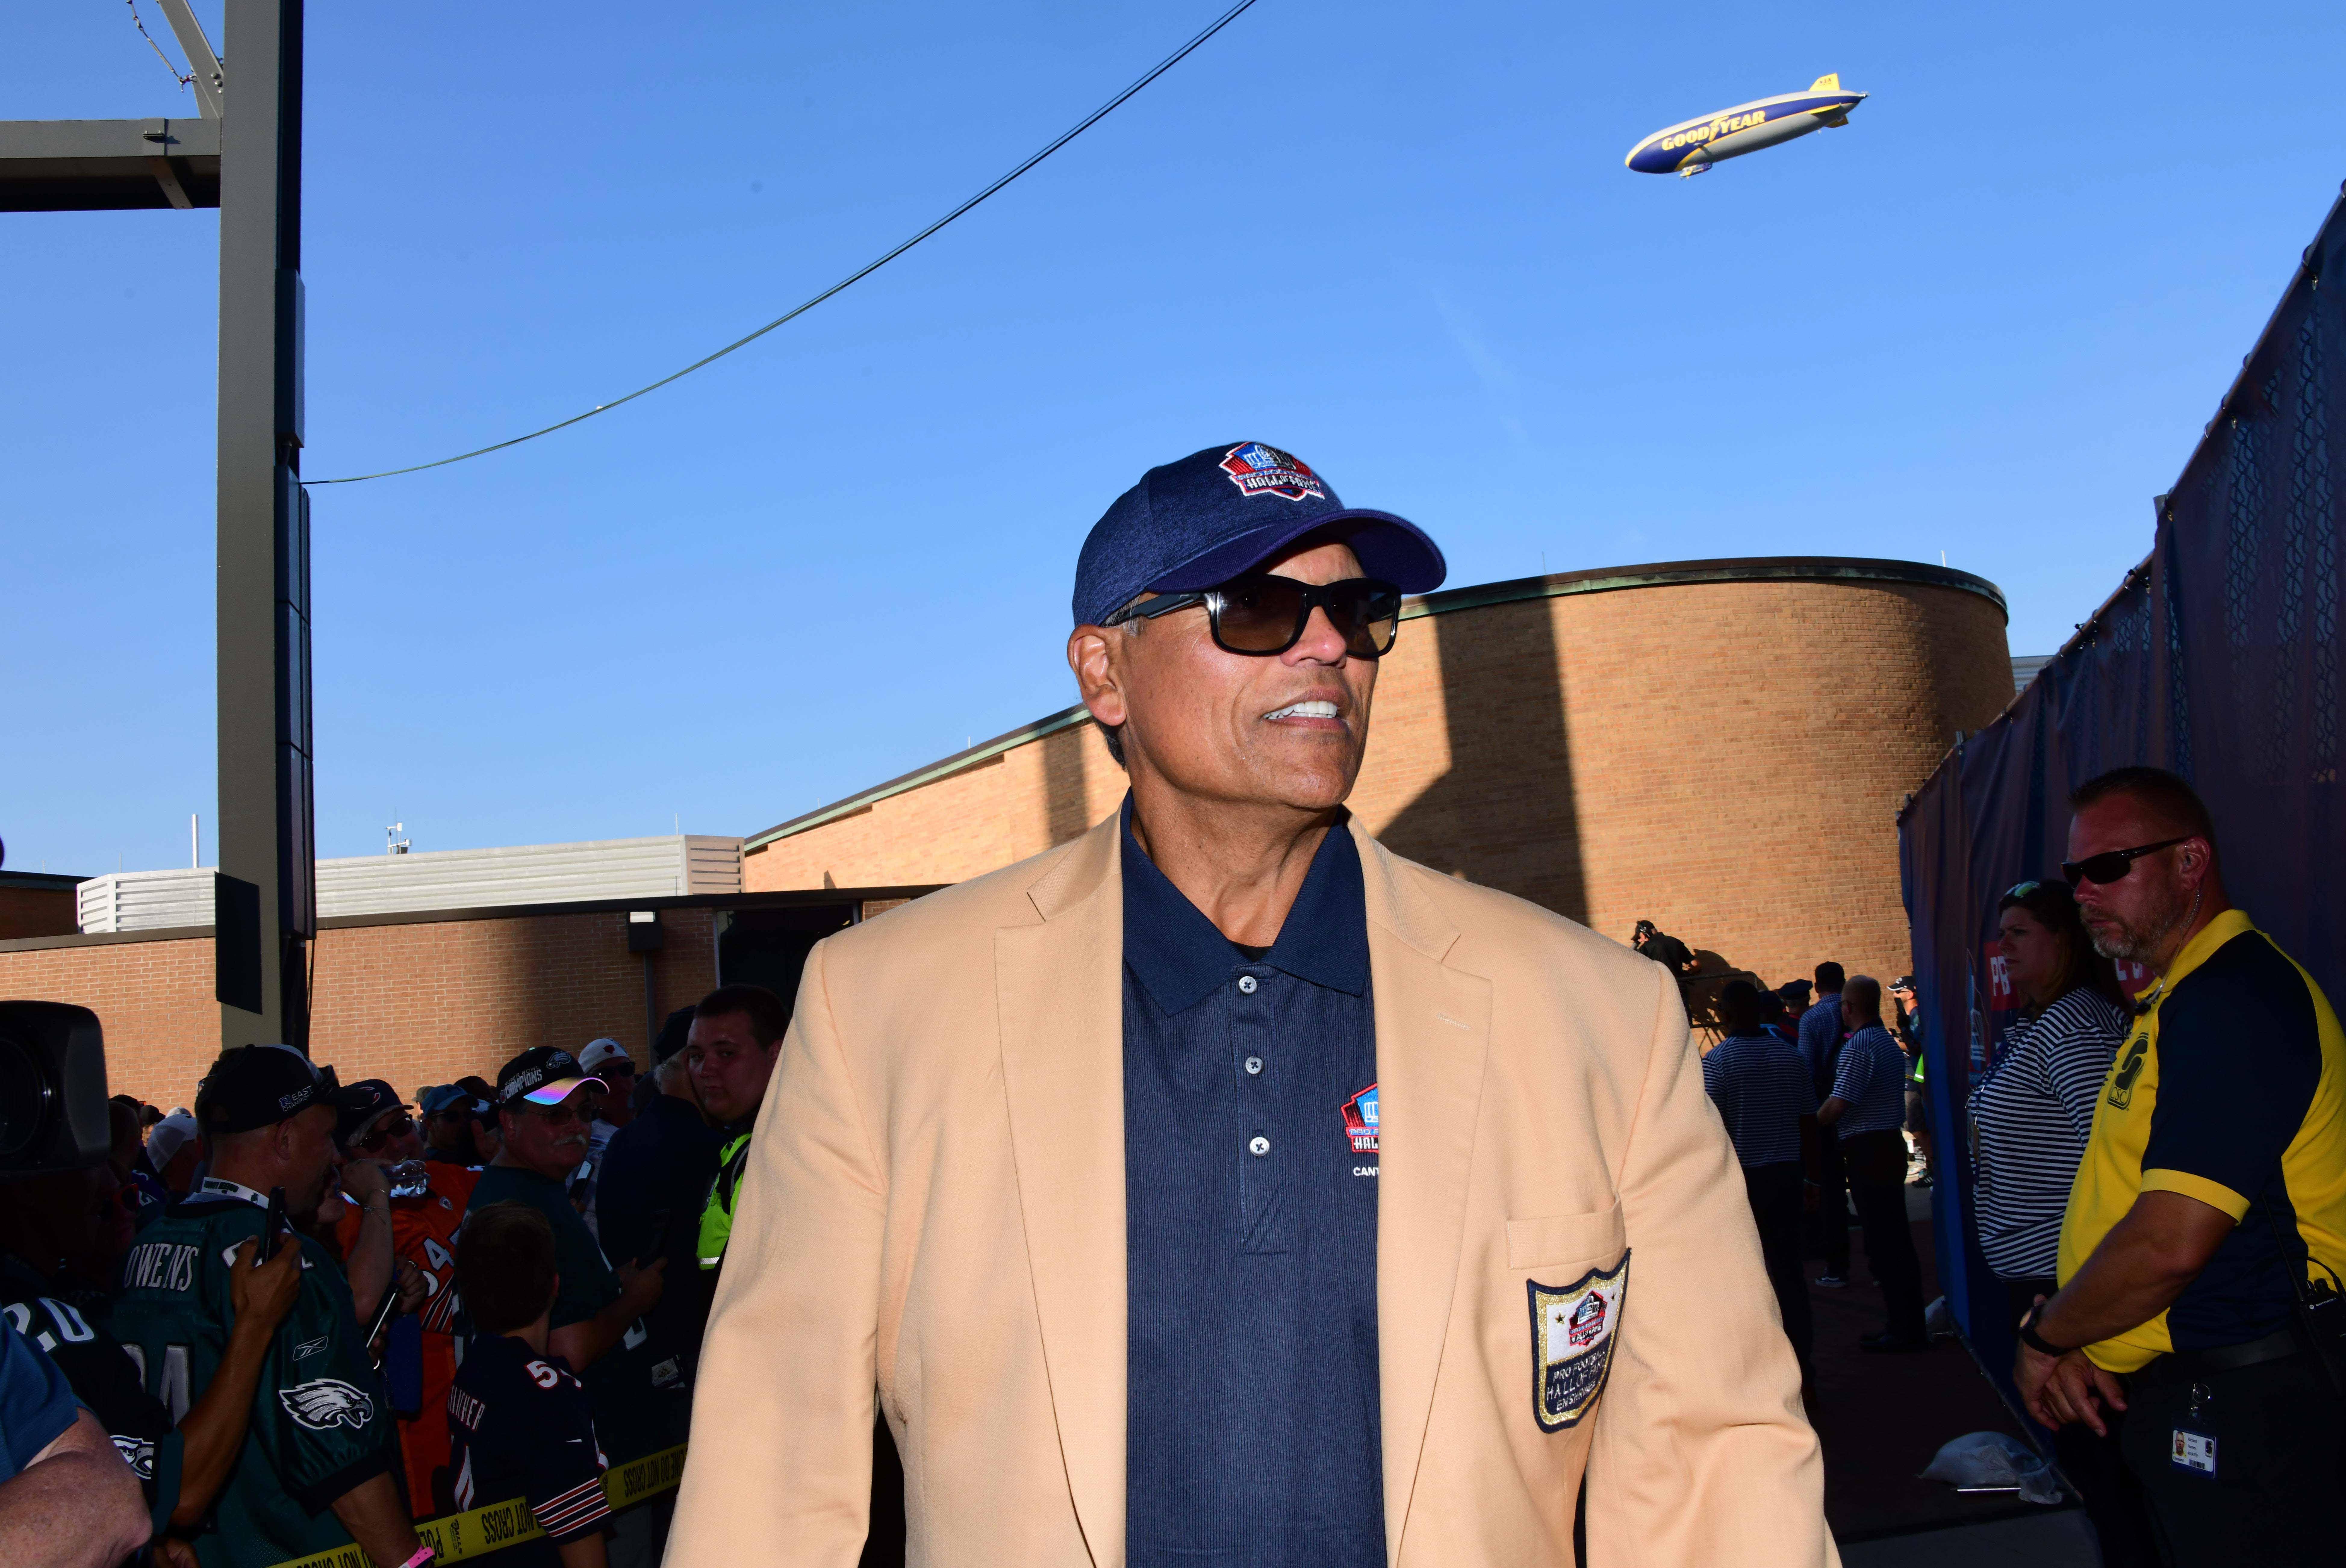 NFL: Pro Football Hall of Fame-Enshrinement Ceremony